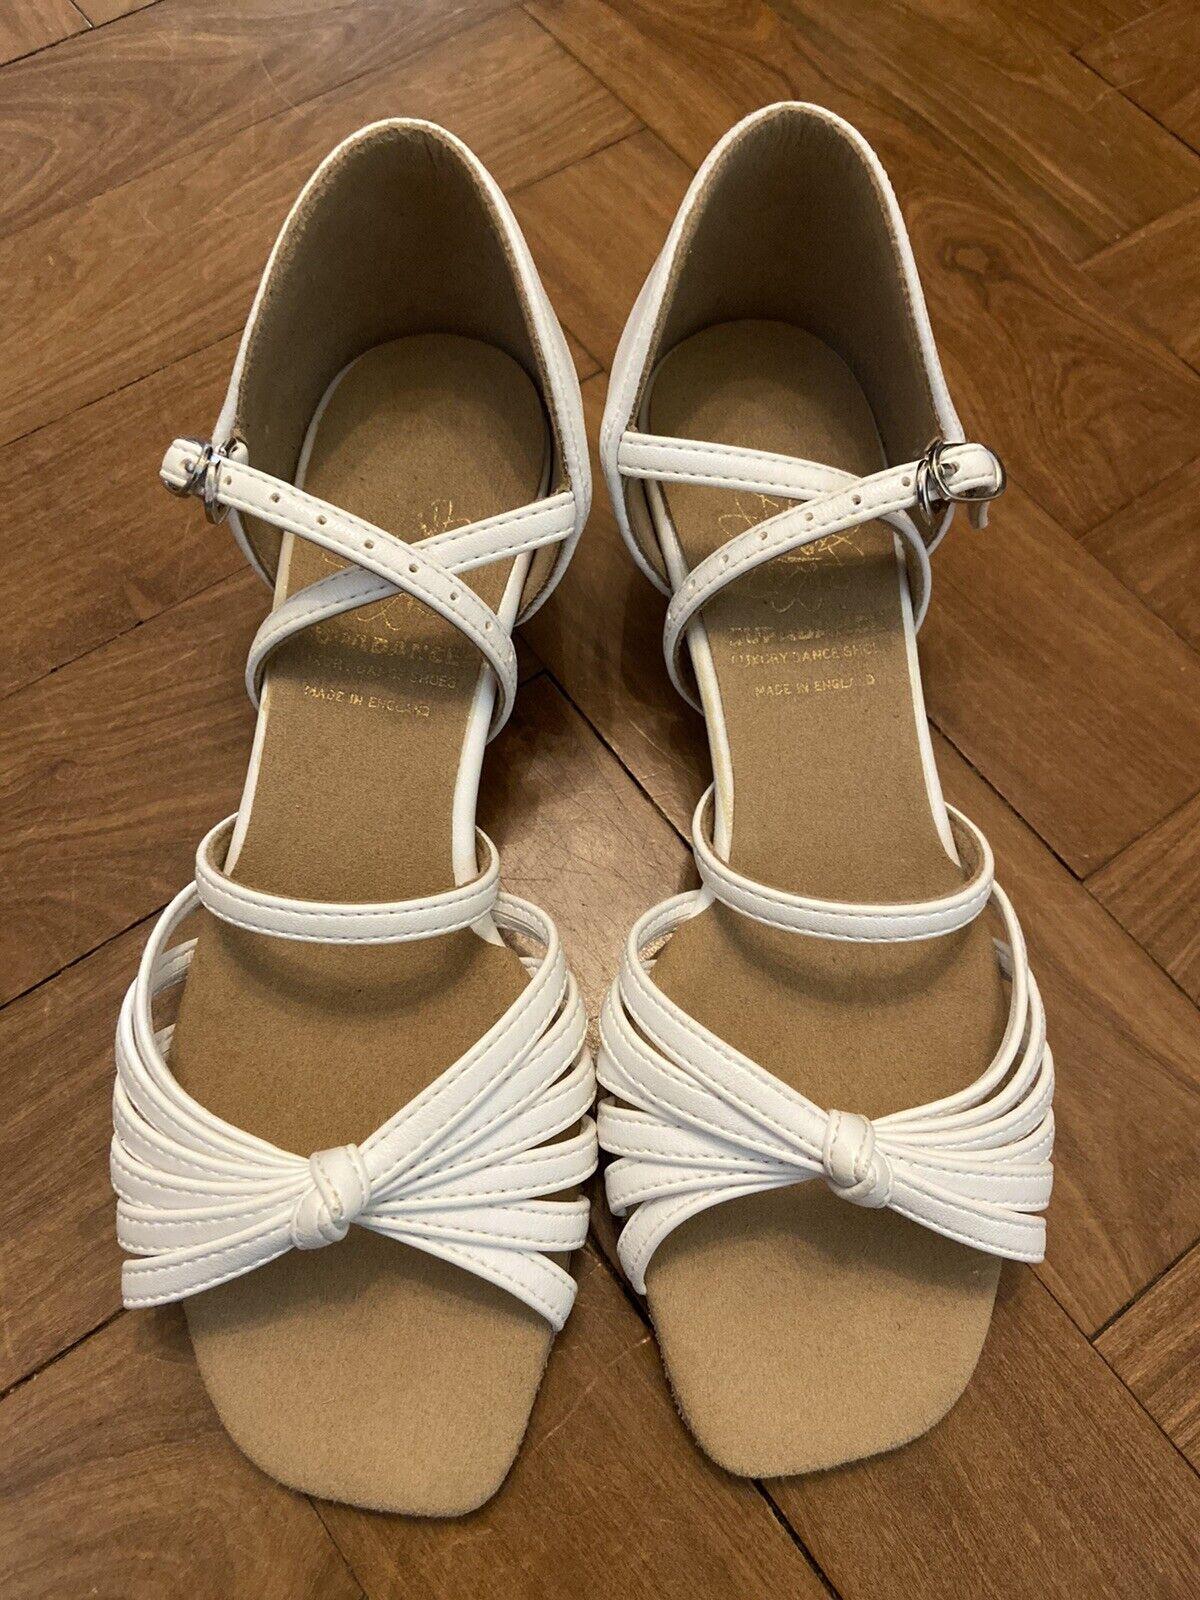 Supadance Juvenile Girls Shoes Size 13